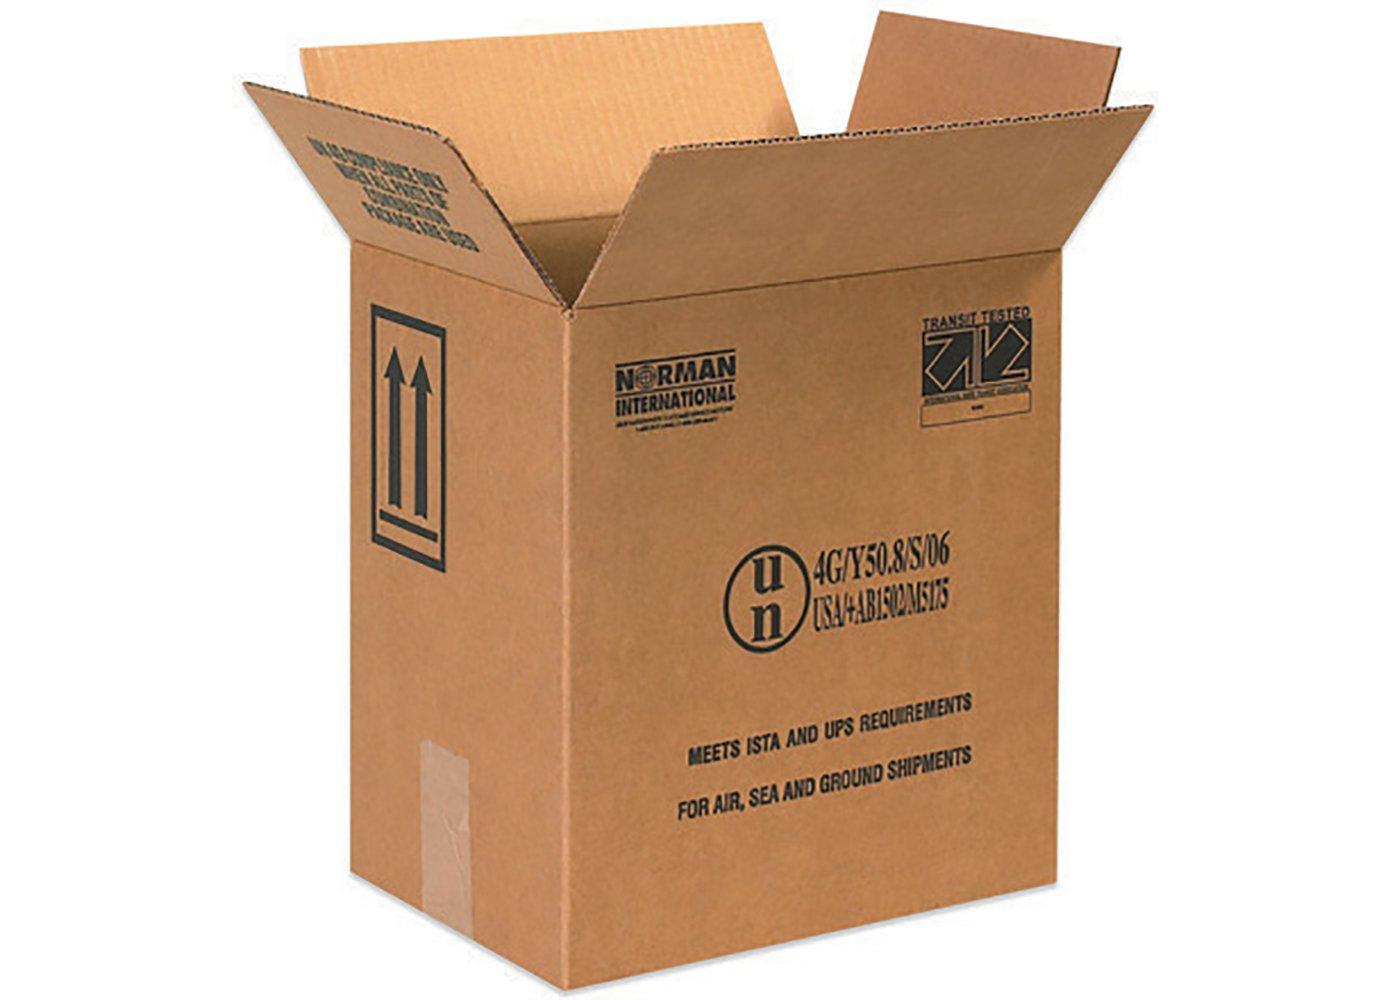 RetailSource B110812HM560 Hazmat Box, 12.375'' Height, 8.1875'' Width, 11.375'' Length, Brown (Pack of 560)